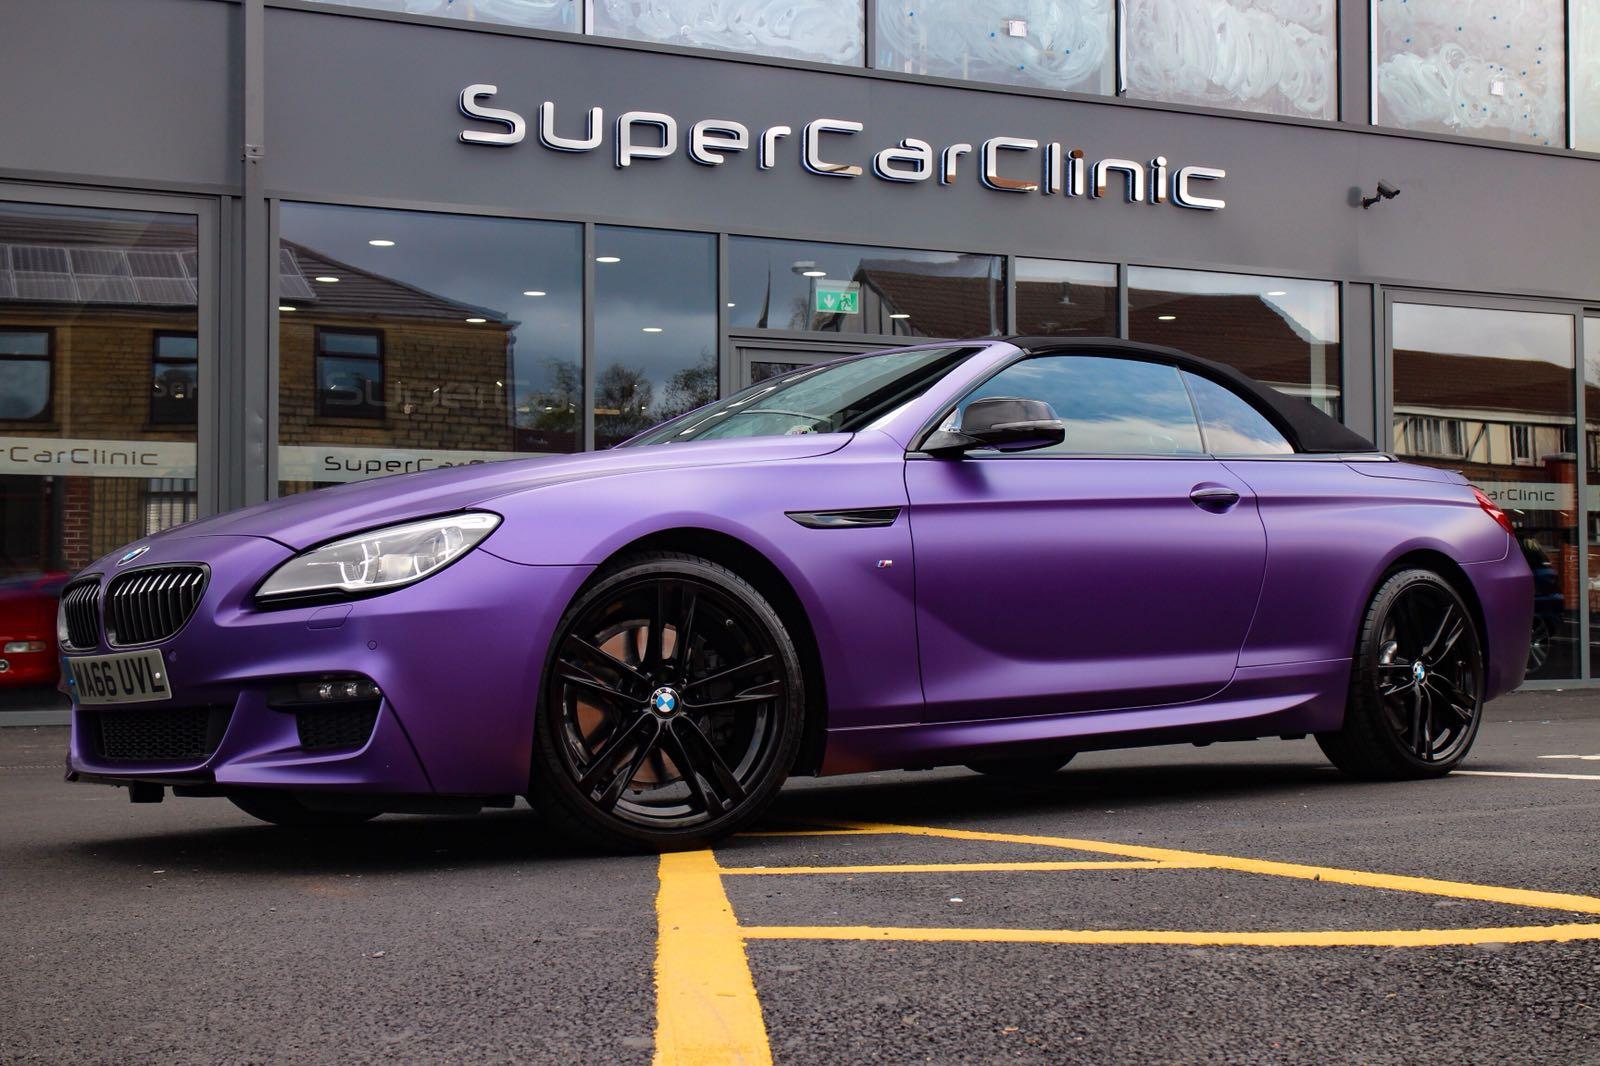 BMW 6 series convertible wrapped in Matt Metallic Purple